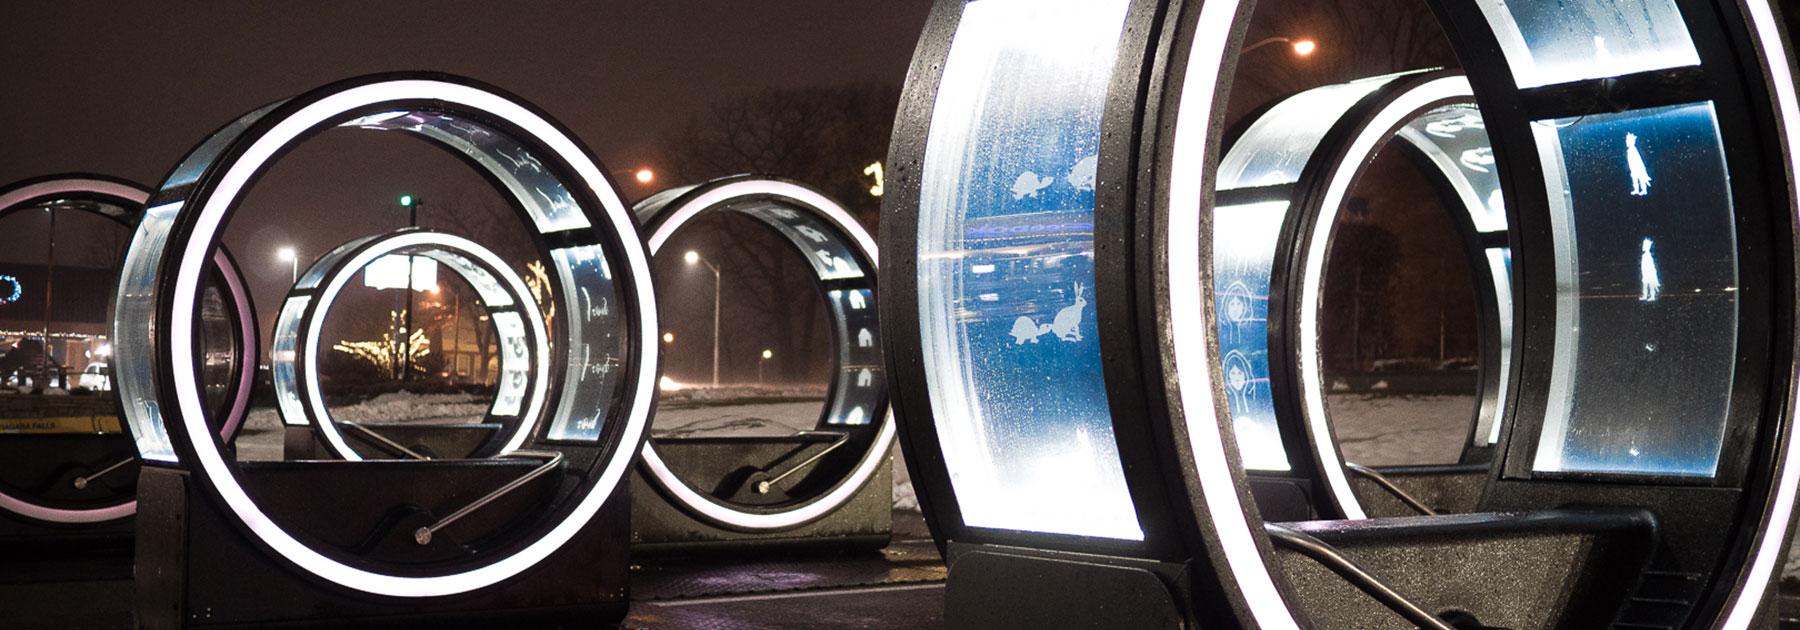 The Loop Illumination Display